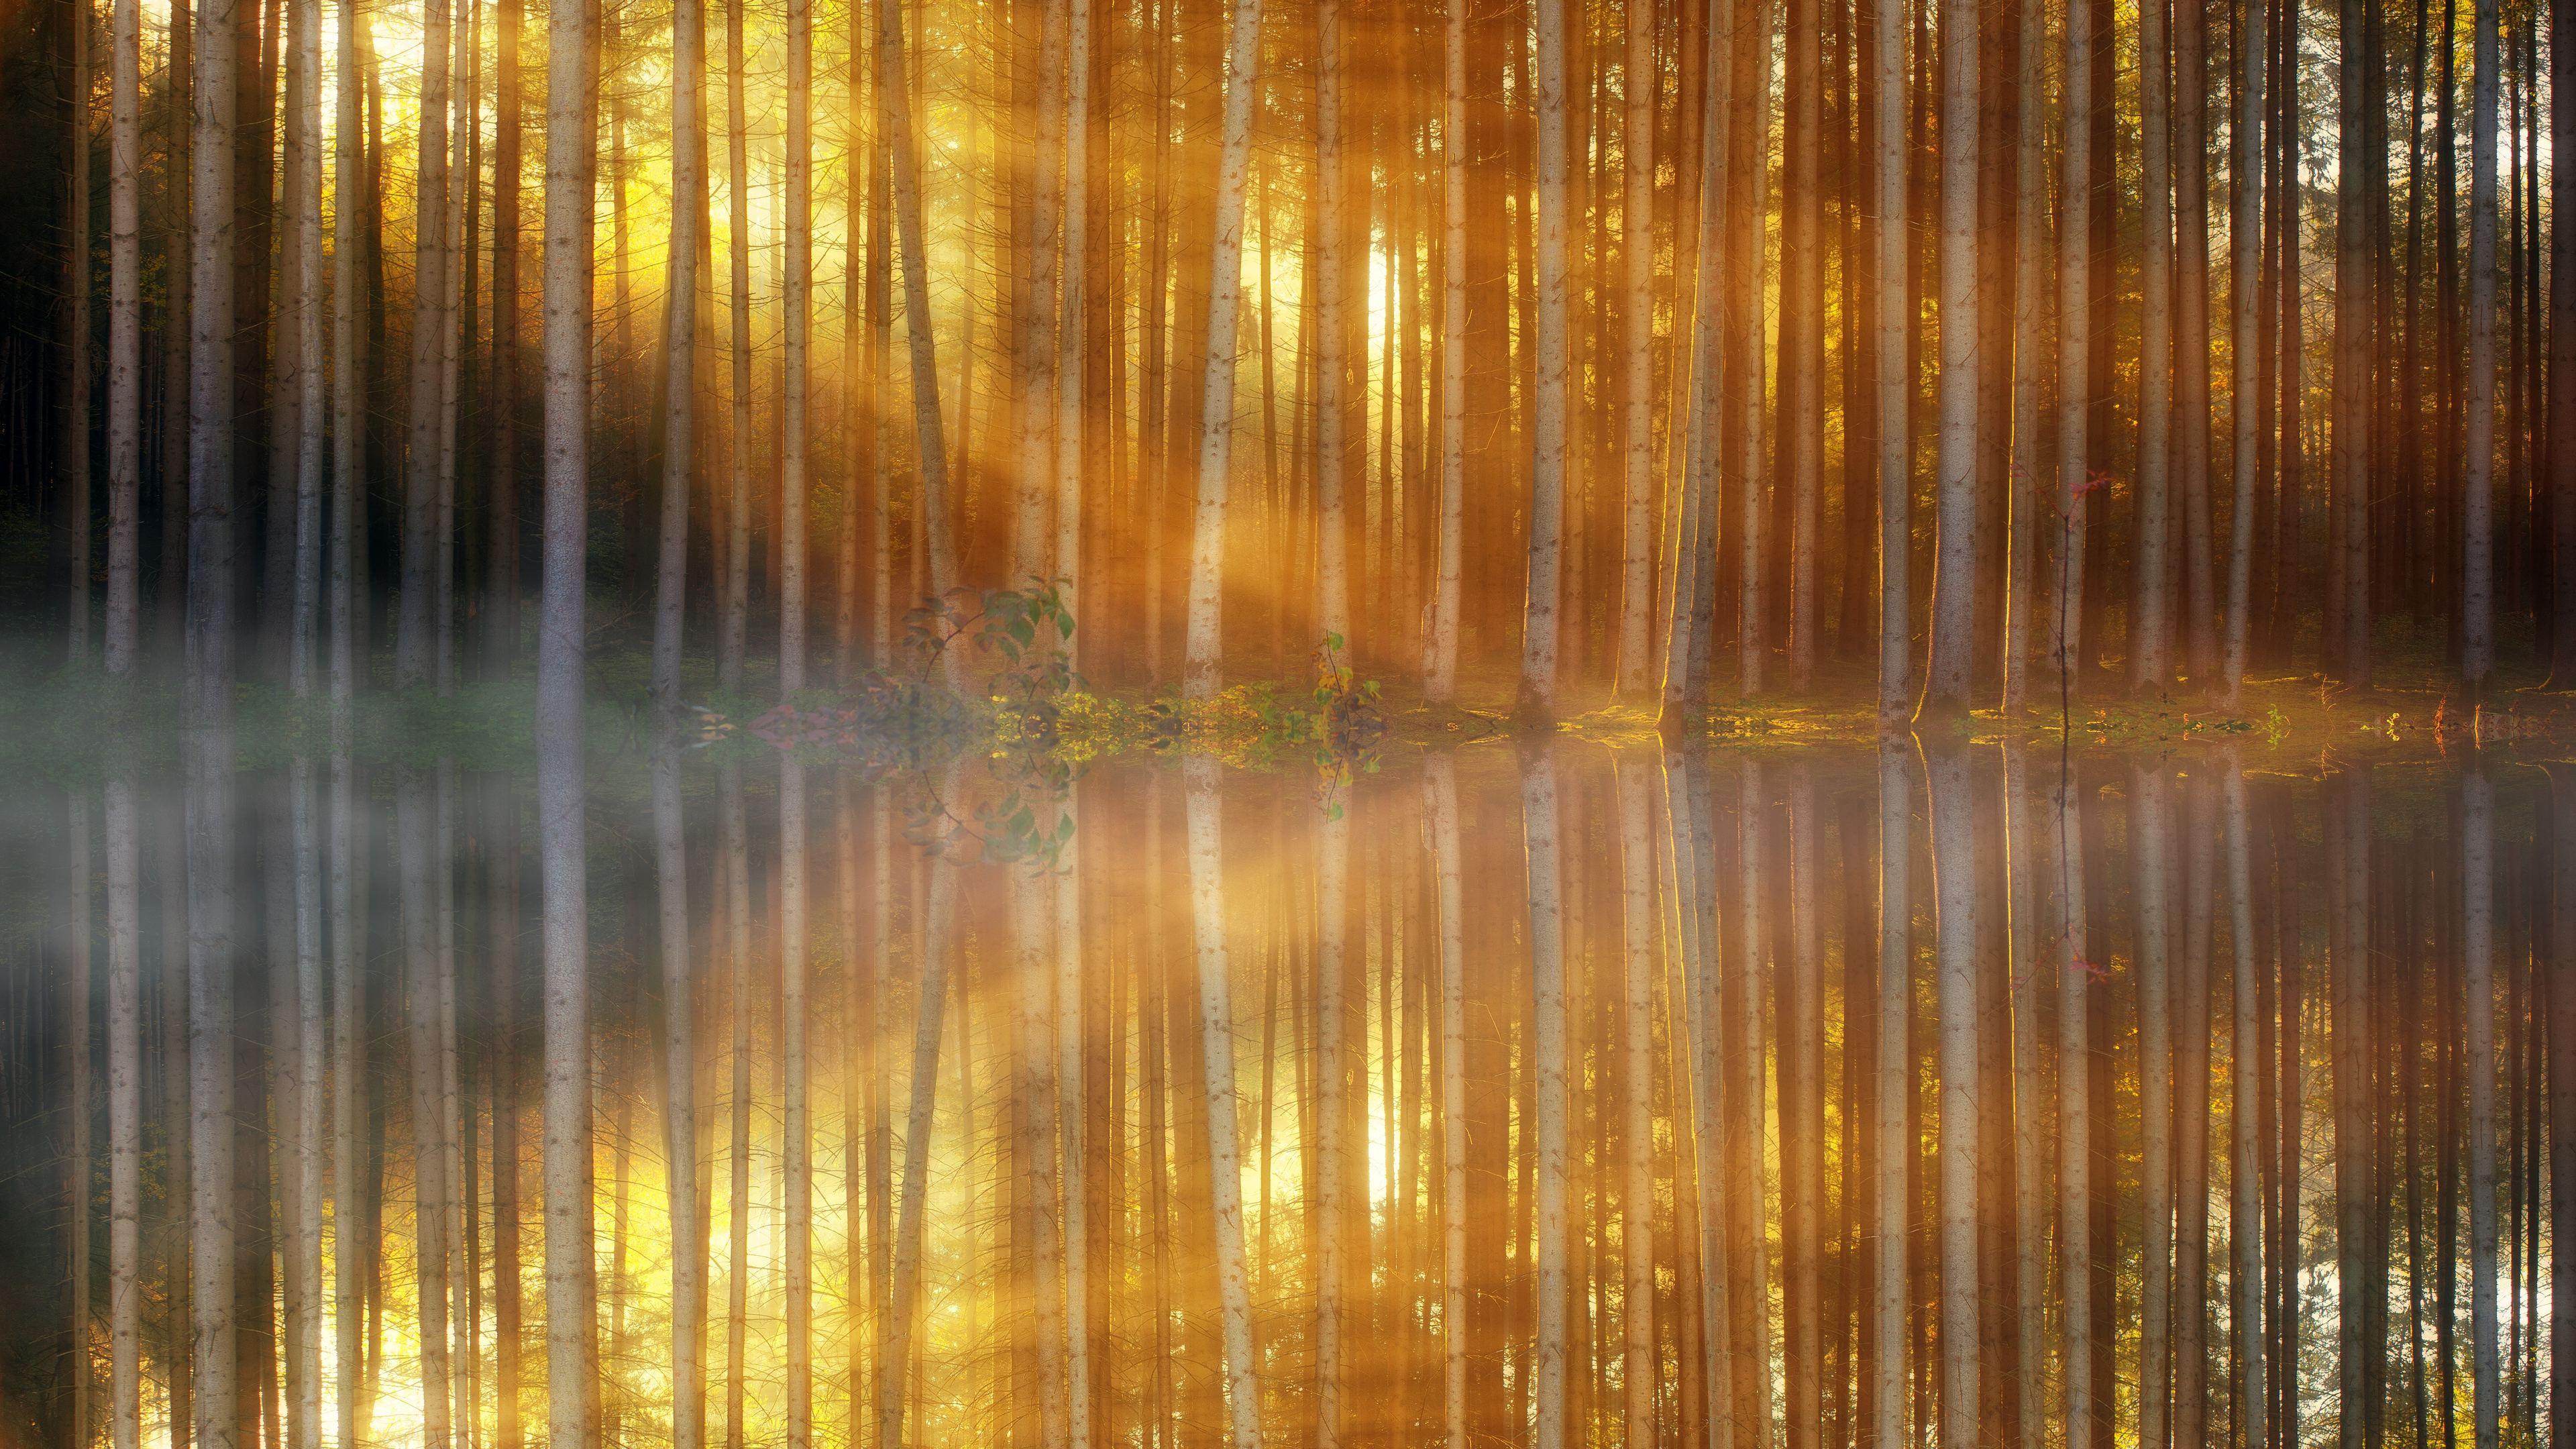 trees lakes sunbeams 4k 1540136528 - Trees Lakes Sunbeams 4k - trees wallpapers, sunbeam wallpapers, nature wallpapers, lake wallpapers, hd-wallpapers, 5k wallpapers, 4k-wallpapers